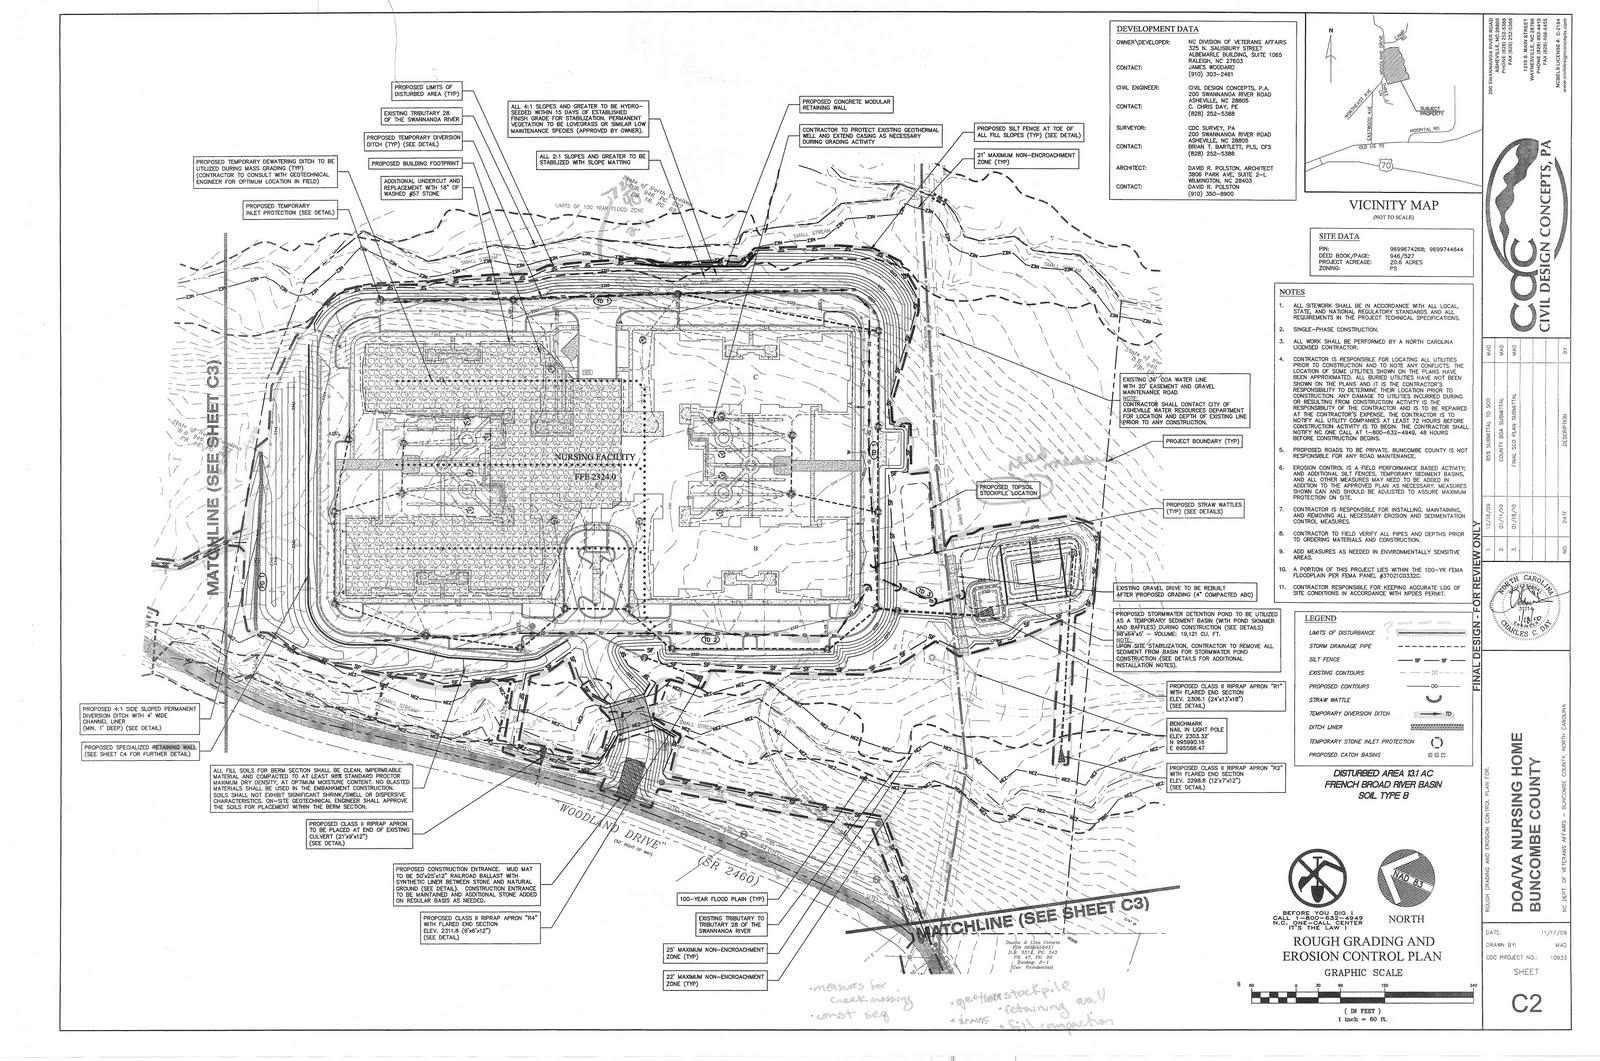 Grovemont Neighbors Of The Va Nursing Home  Construction Info